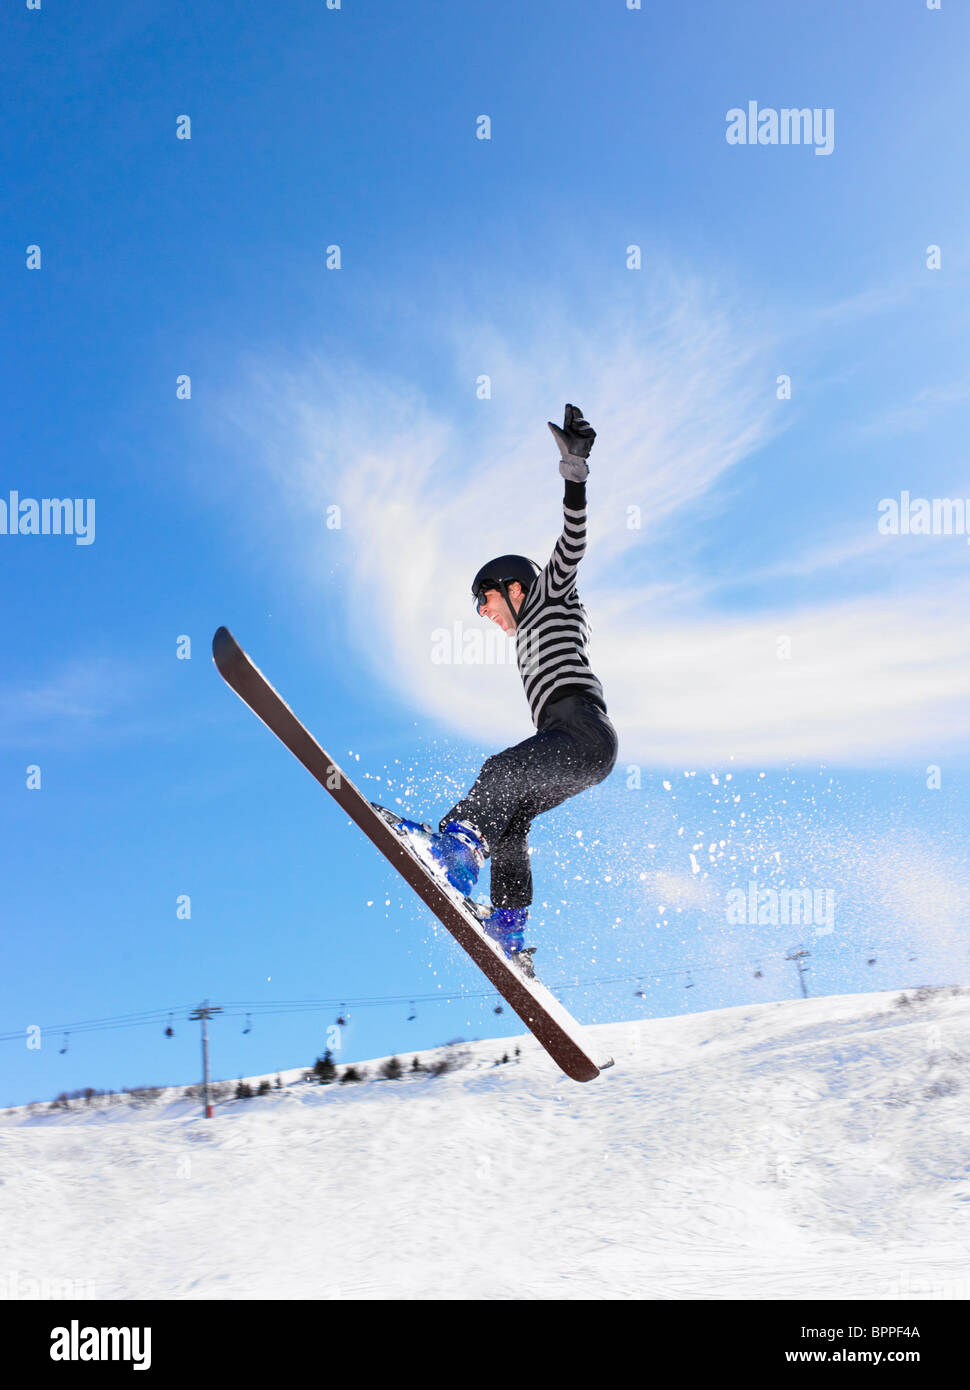 Wintersport-Urlaub Stockbild